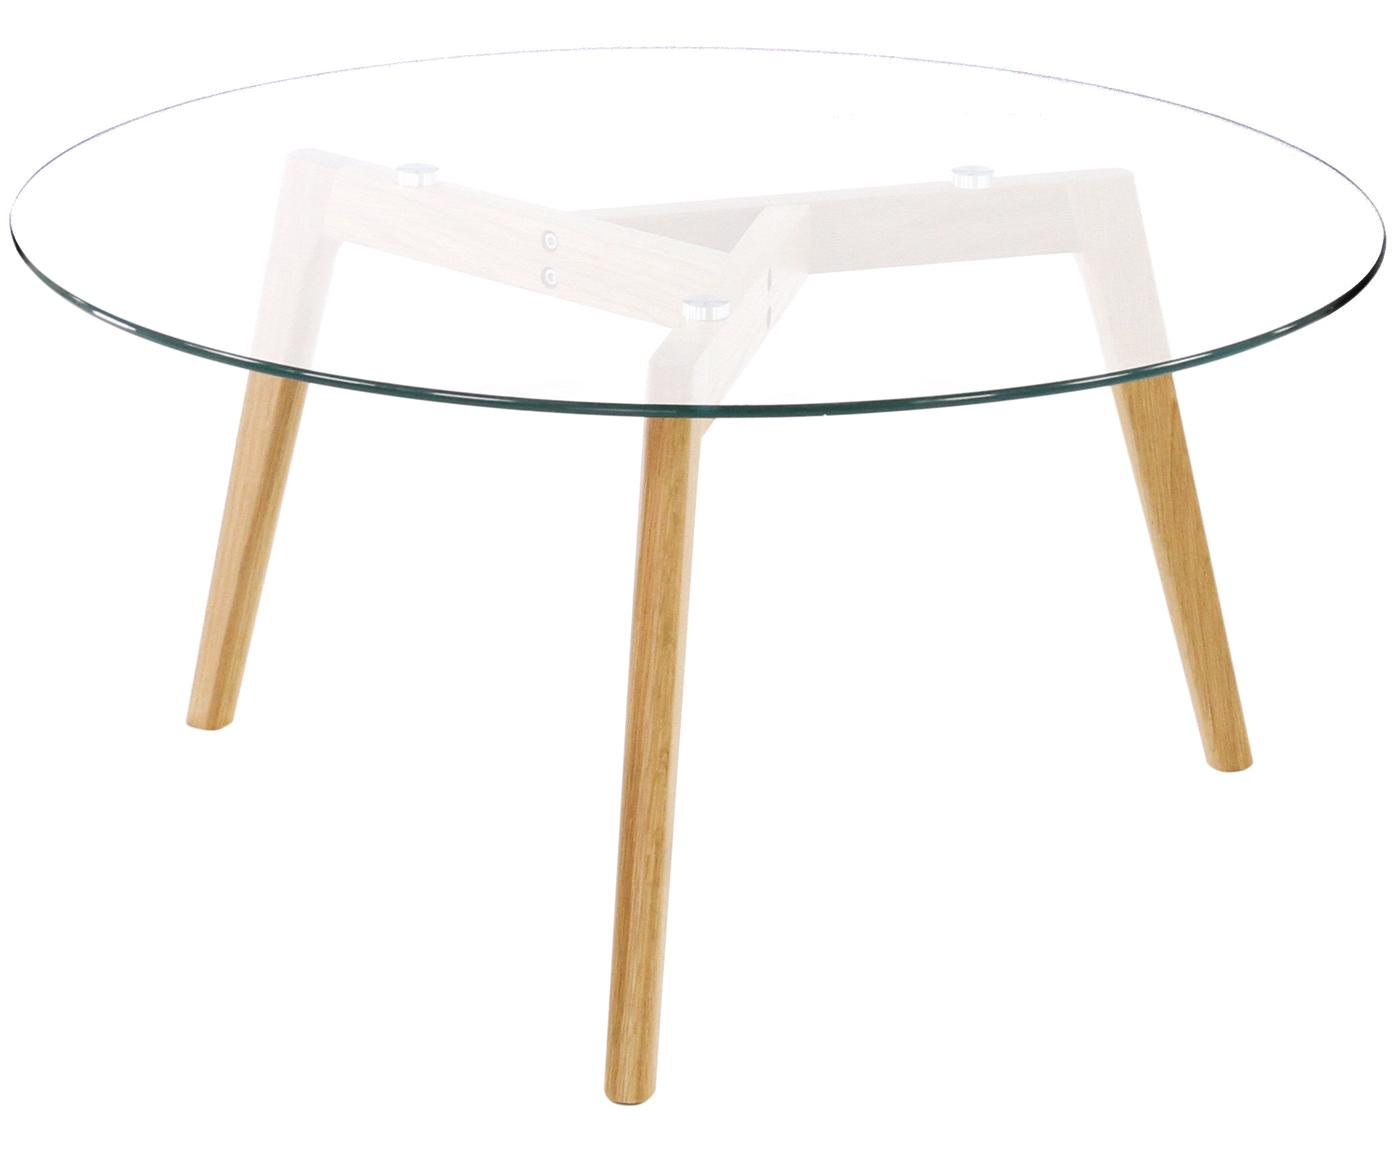 Mesa de centro redonda Bloom, tablero de cristal, Patas: madera de roble aceitada, Tablero: vidrio, Transparente, Ø 90 x Al 40 cm